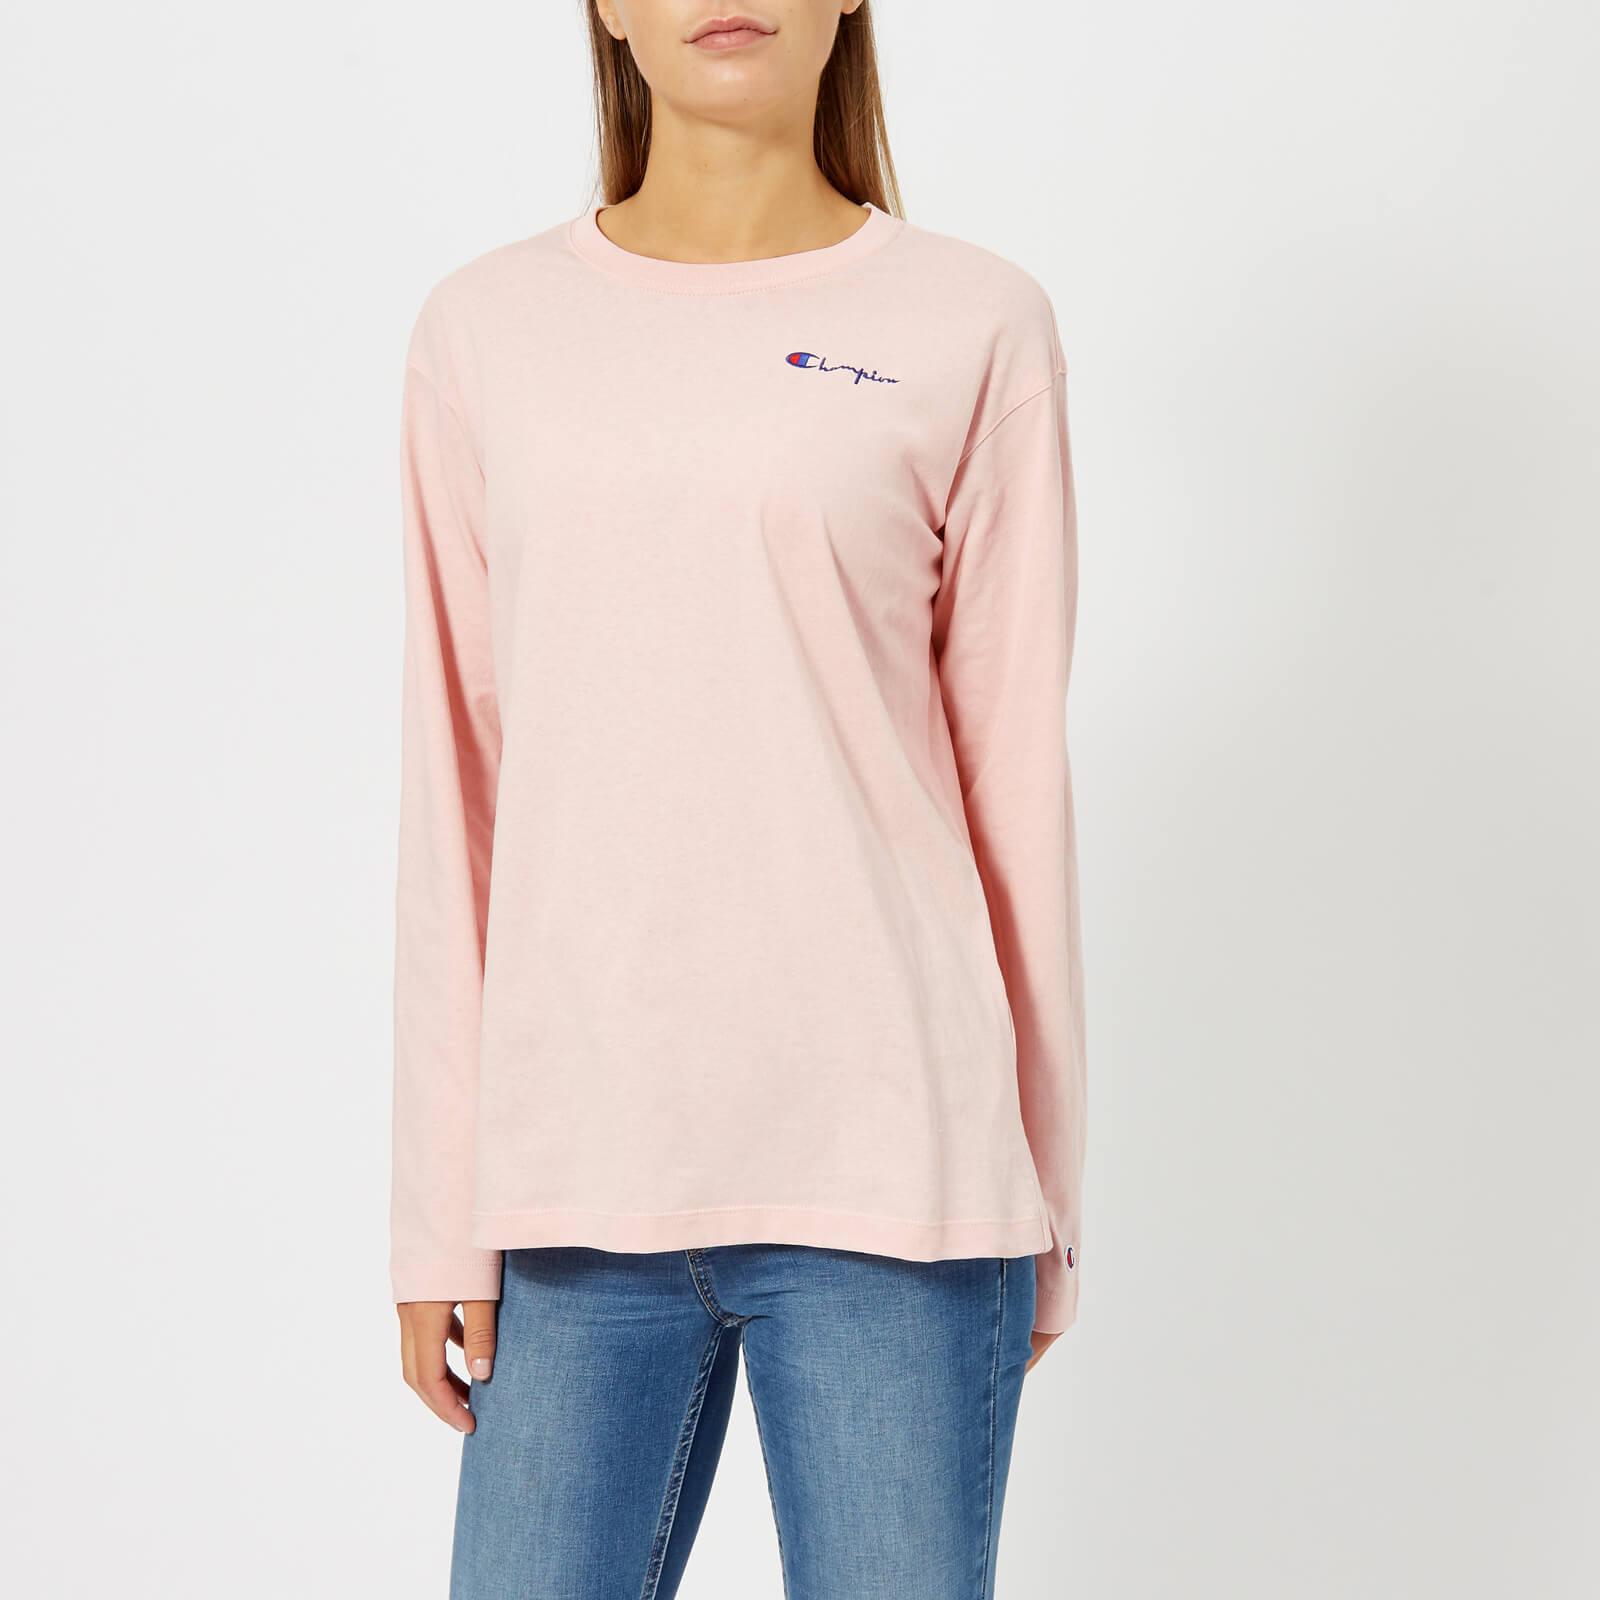 champion t shirt womens uk